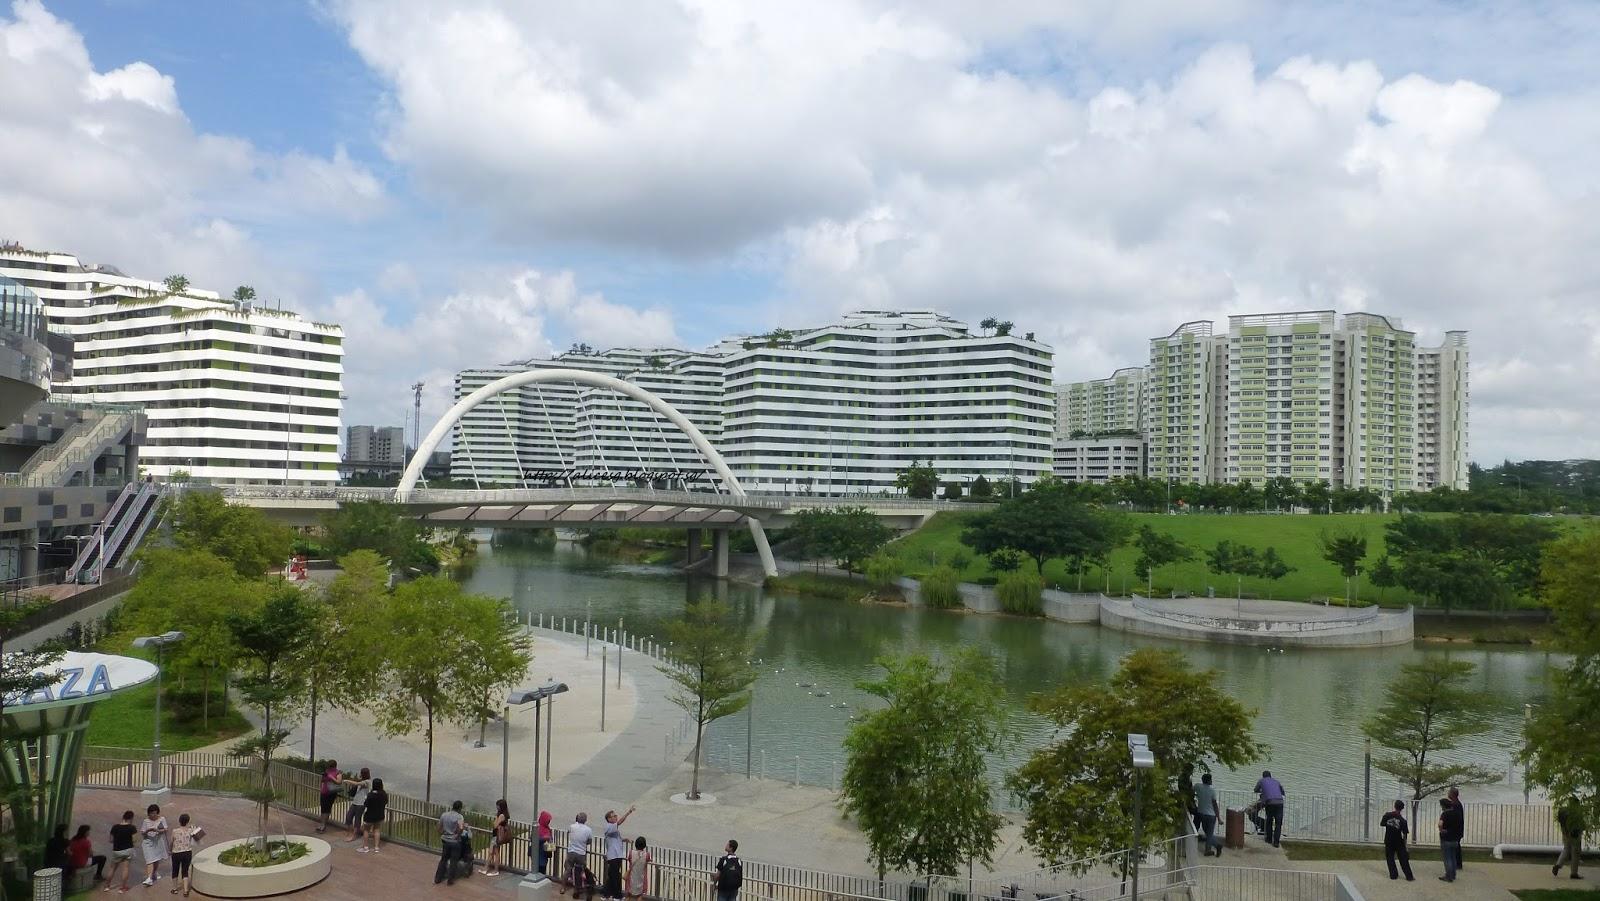 Alicesg Singaporemyhome Punggol Waterway And Waterway